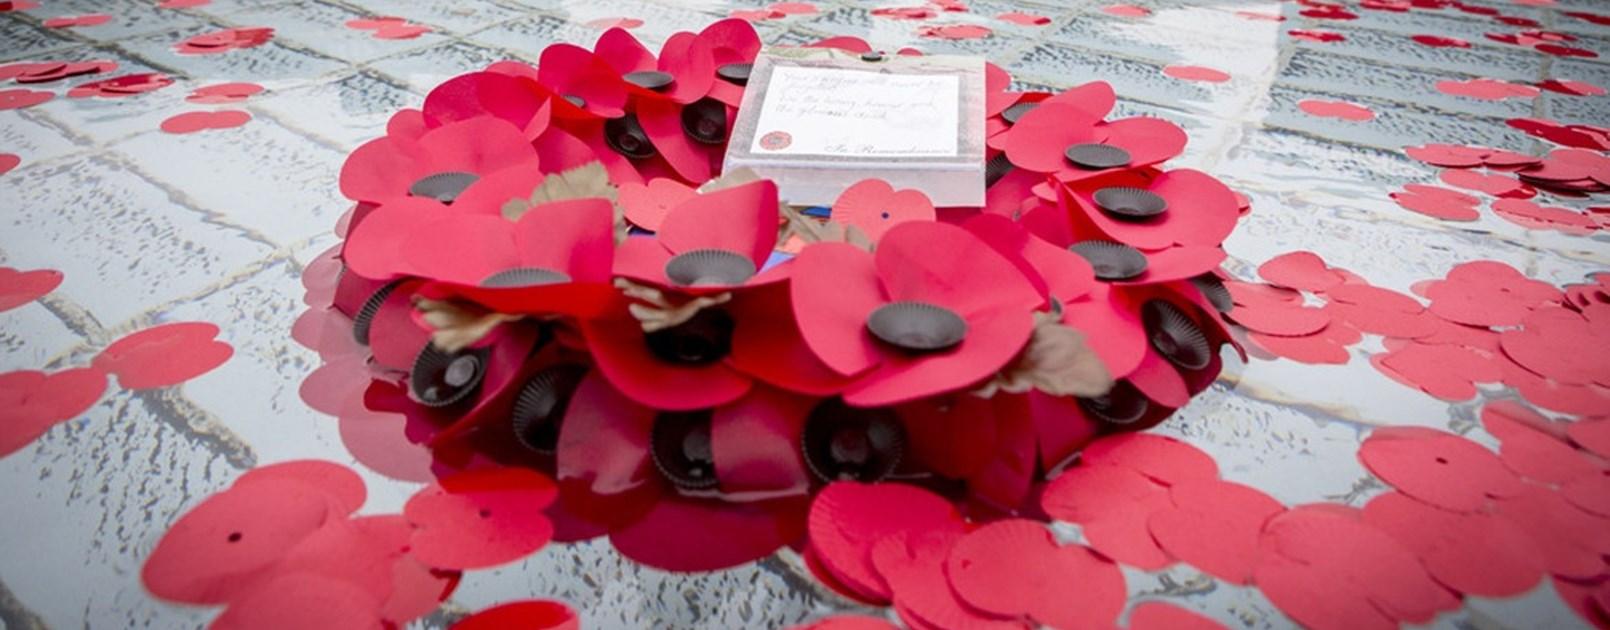 Camberley Royal British Legion Poppy Day Launch